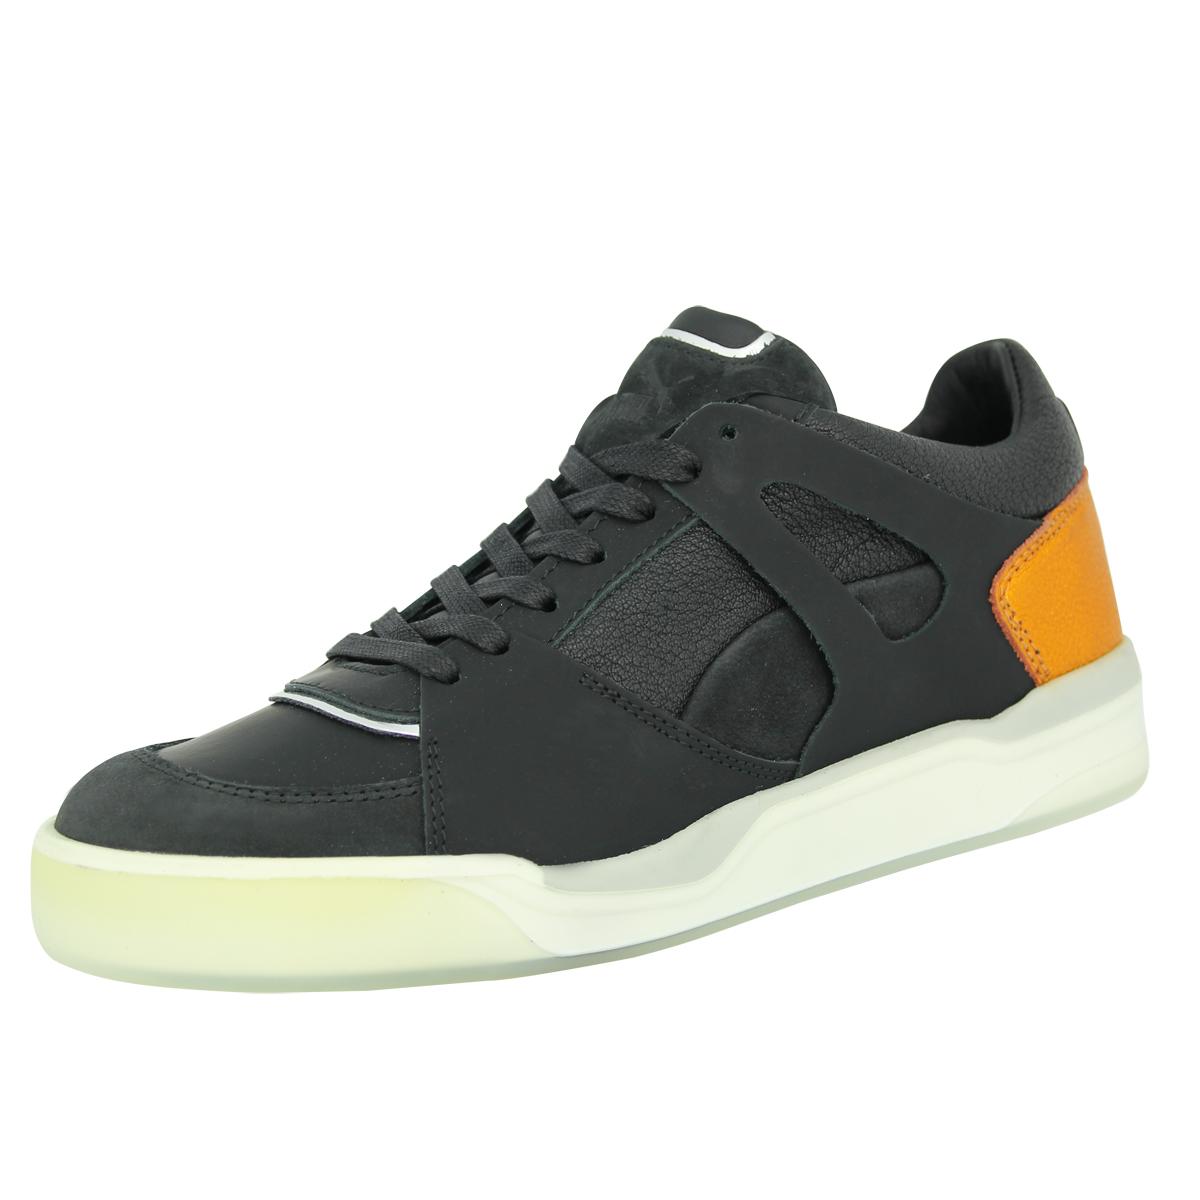 Puma soit + McQ Move Femme Lo Noir Femme Baskets Chaussures NEUF